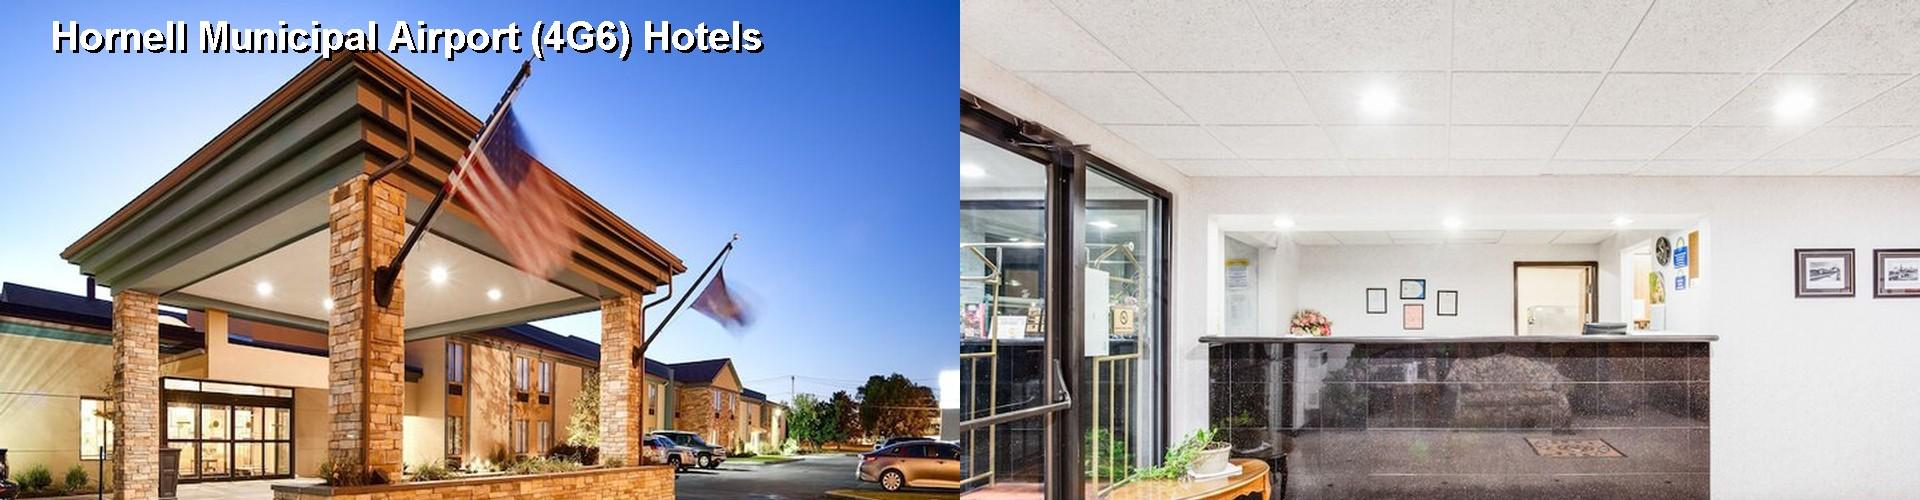 3 Best Hotels Near Hornell Munil Airport 4g6